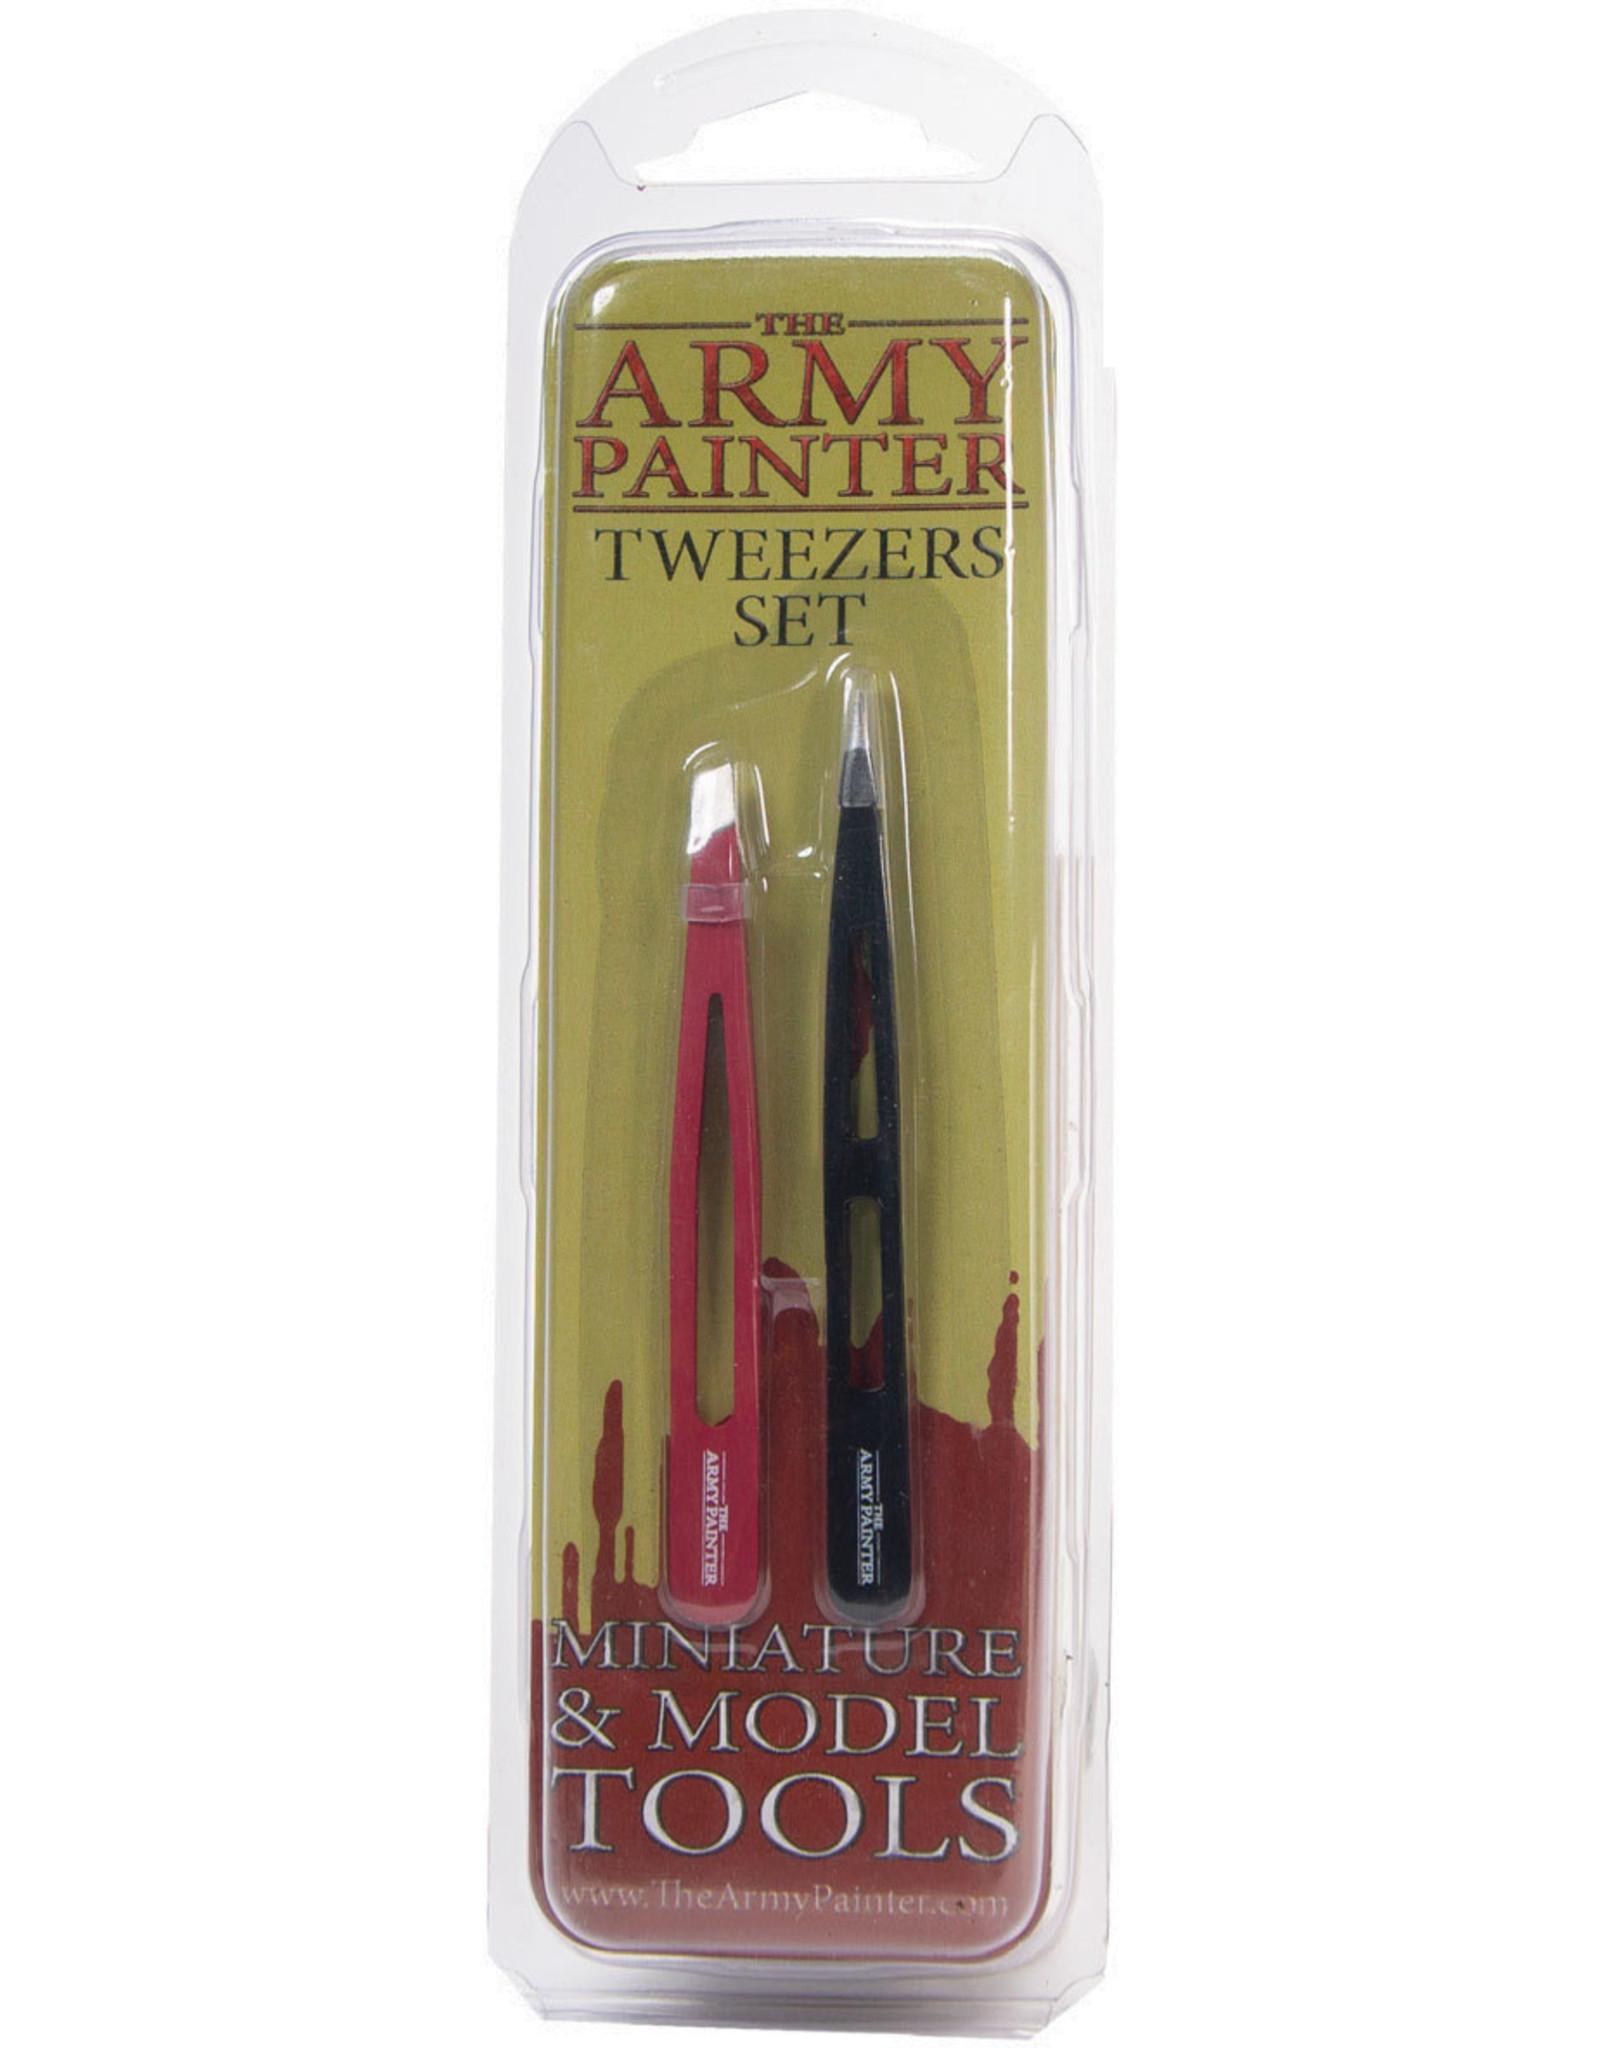 Army Painter Army Painter: Tweezers Set